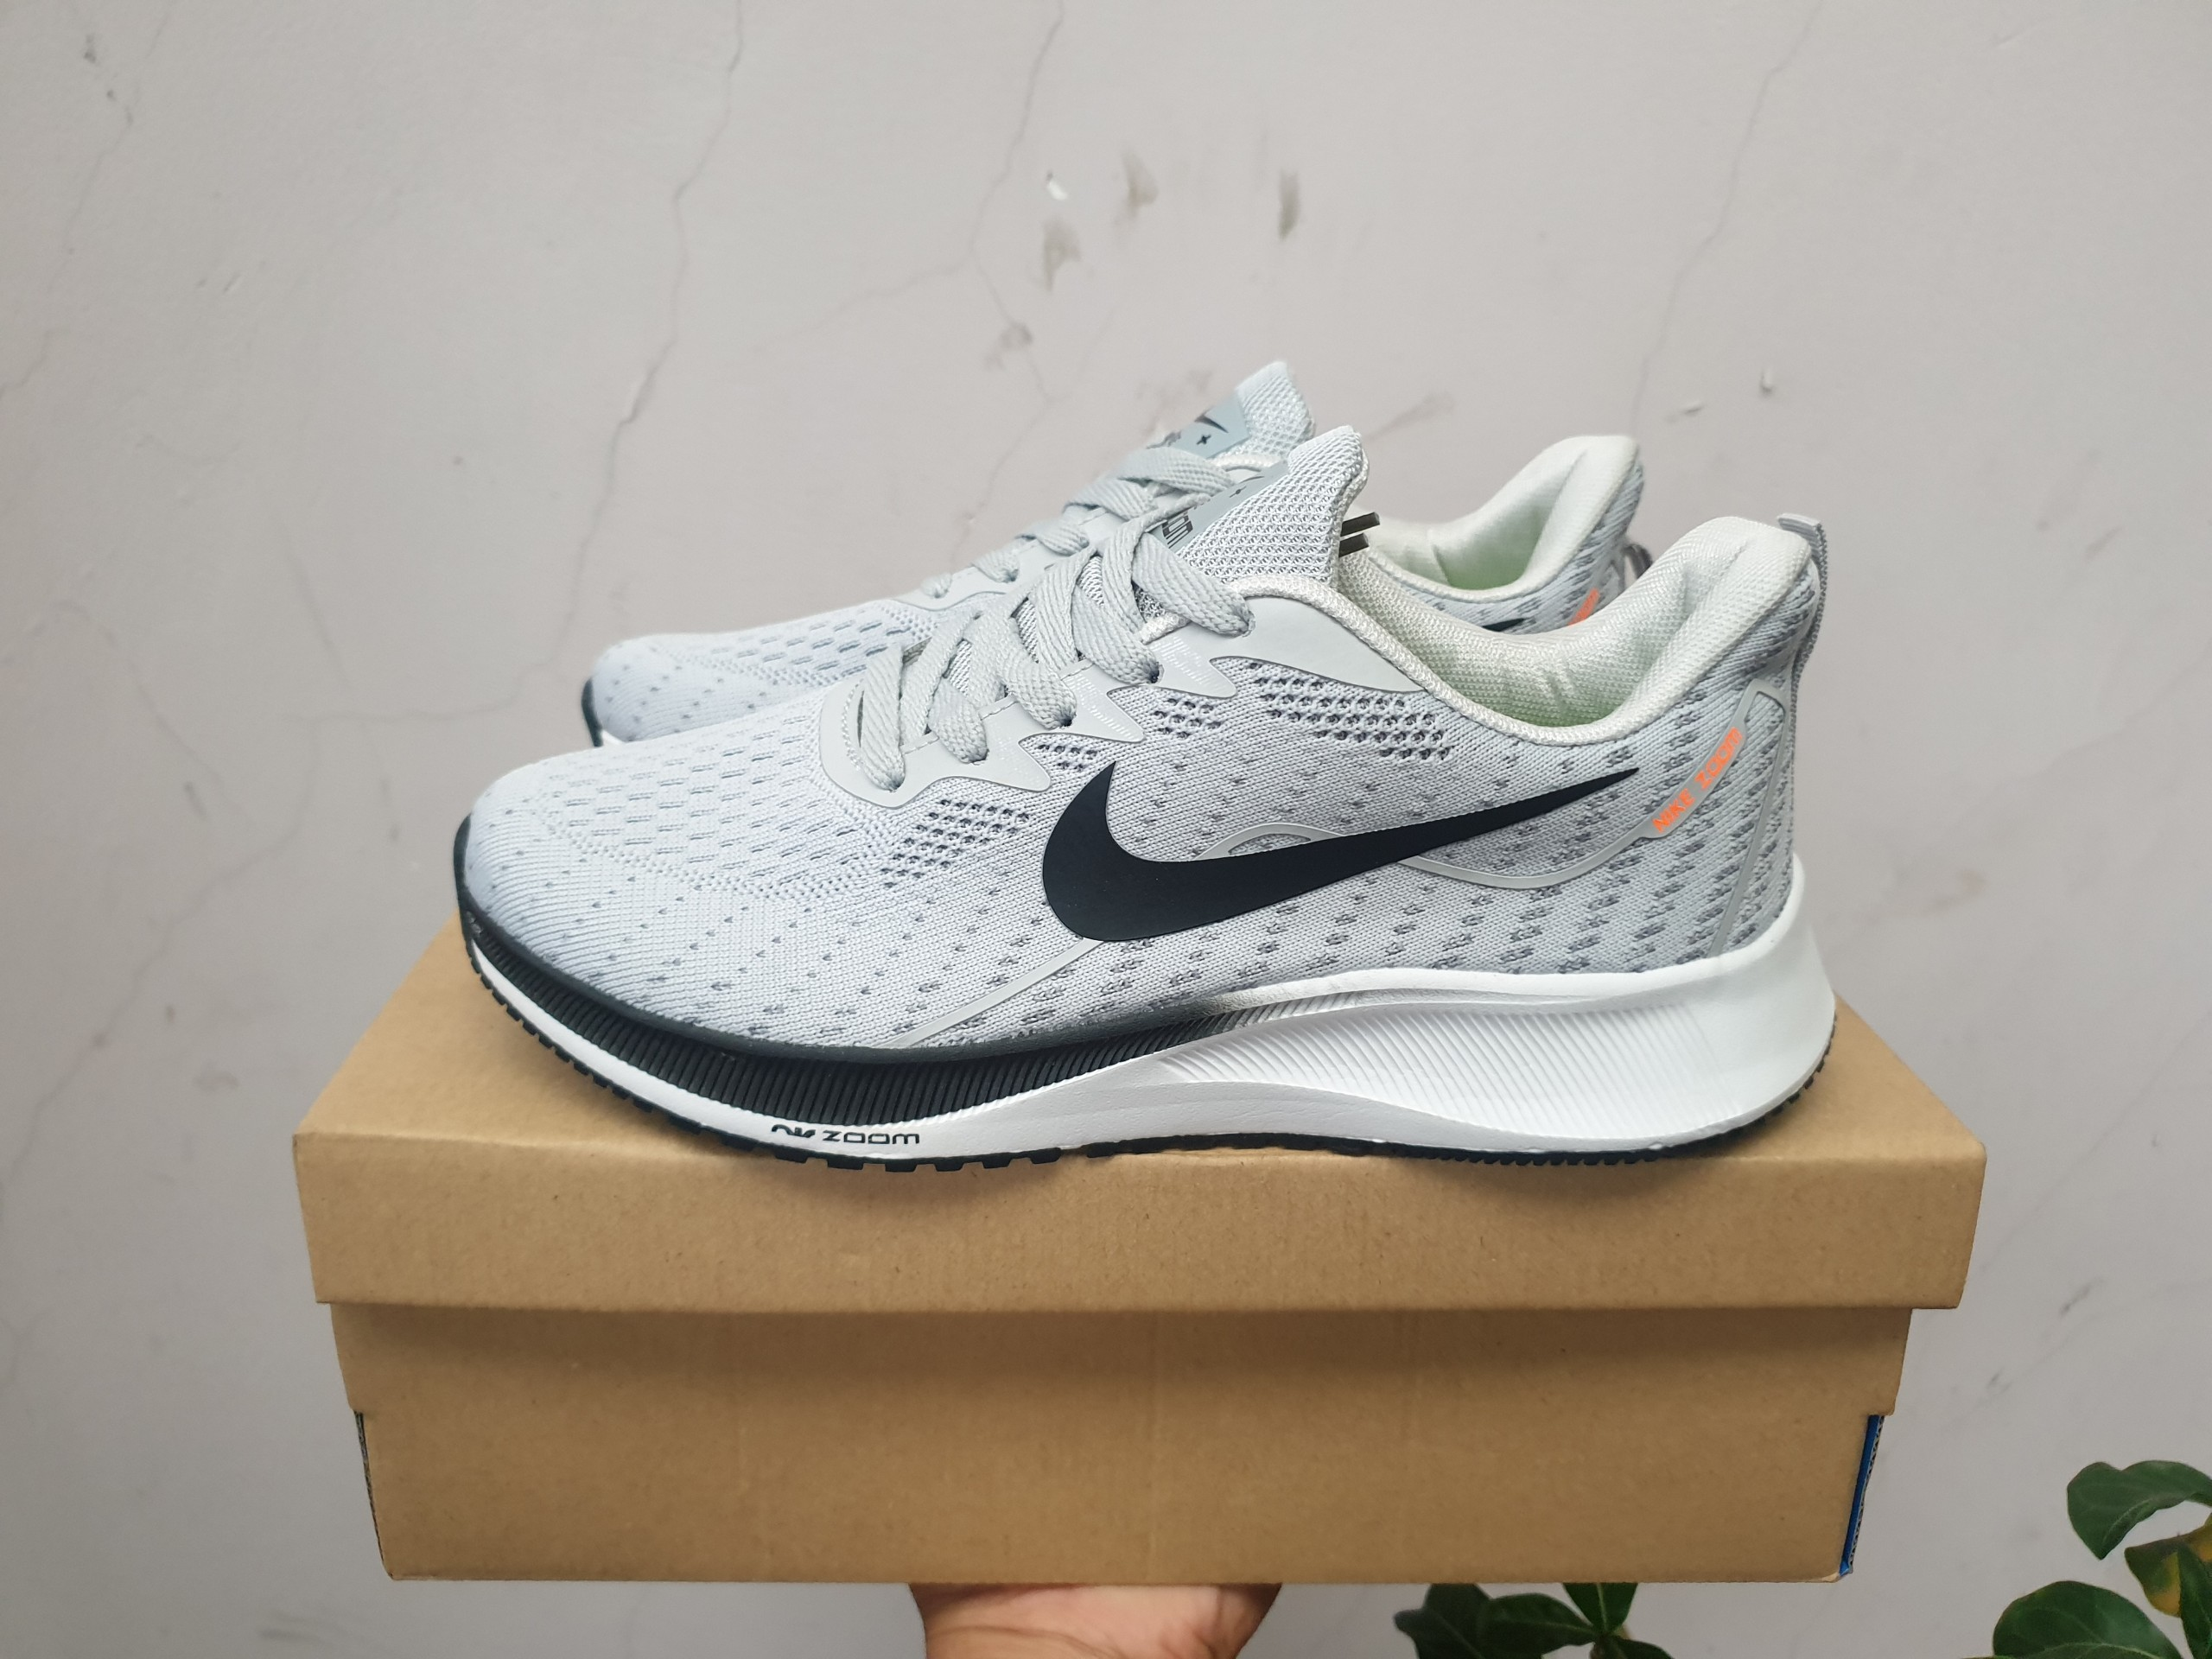 Giày Nike Zoom 1 xám